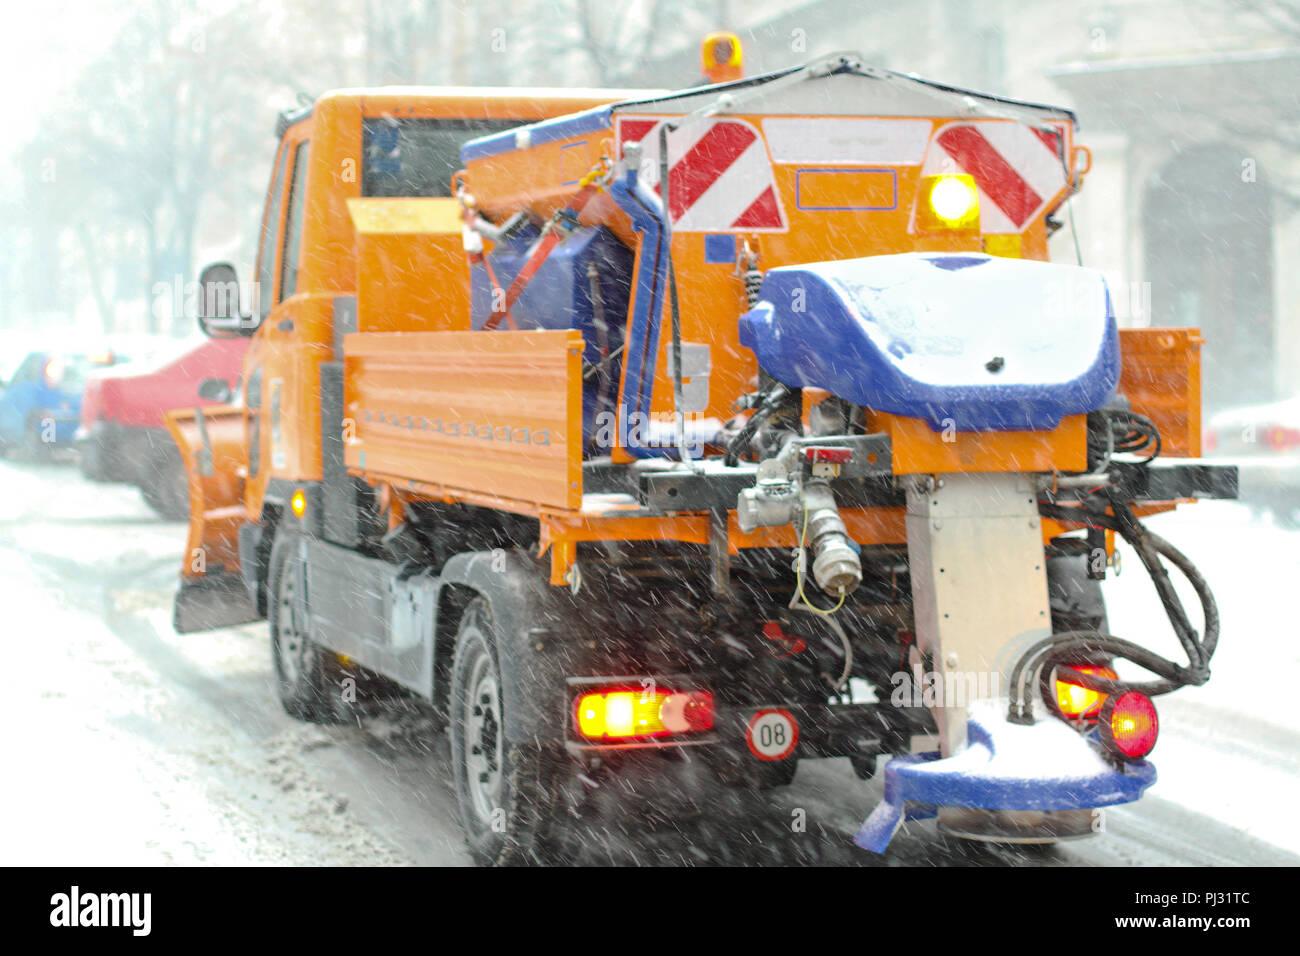 Spreader truck in winter snow blizzard weather - Stock Image